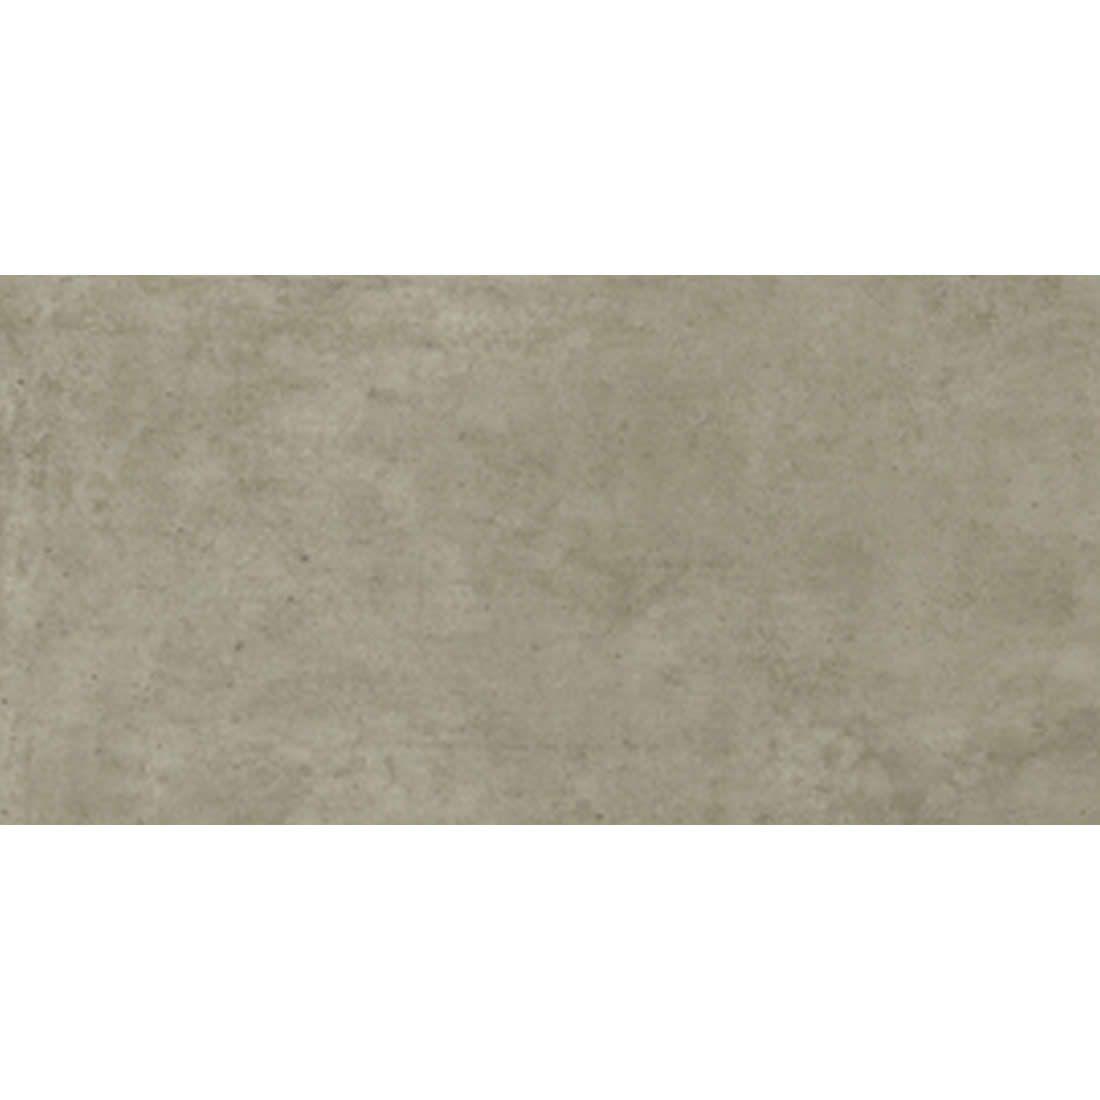 Porcelanato Delta Toronto Cement Out 50x100 Borda Reta Rústico